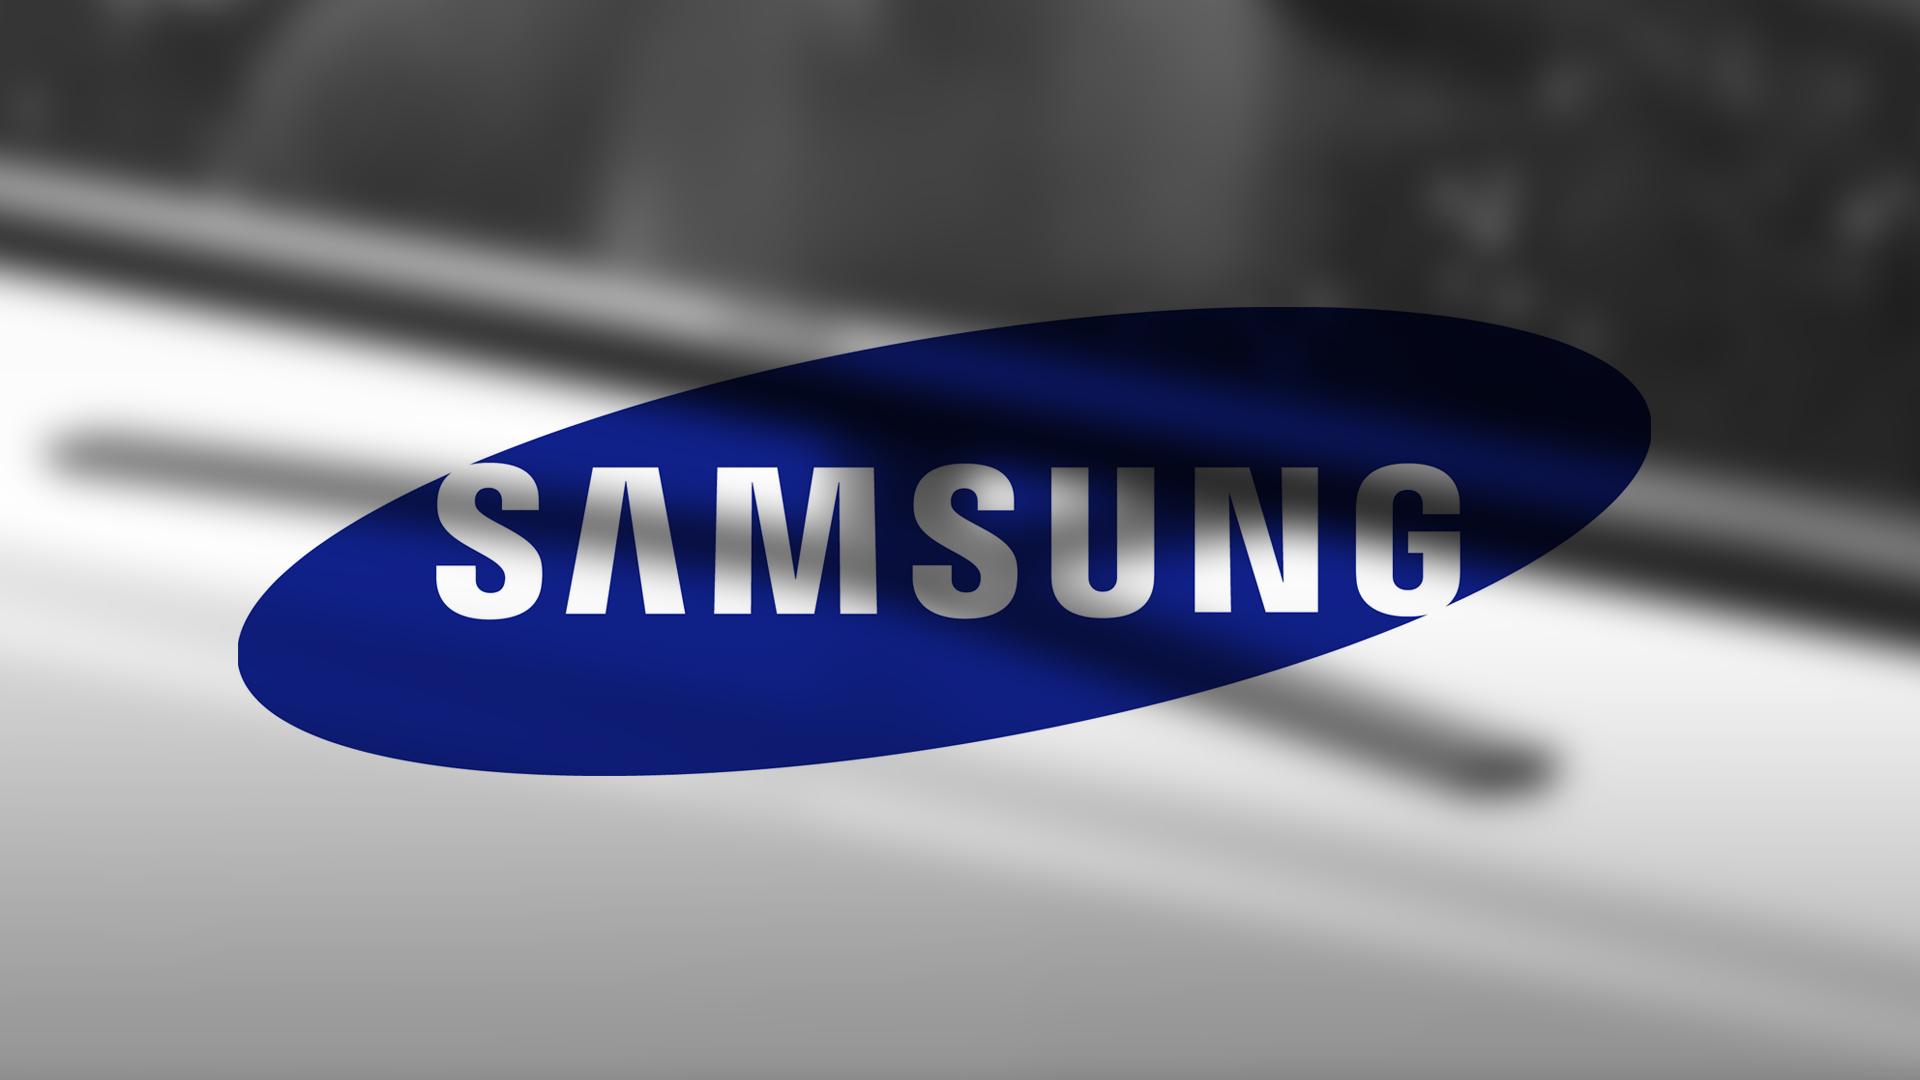 SAMSUNG HOME.jpg